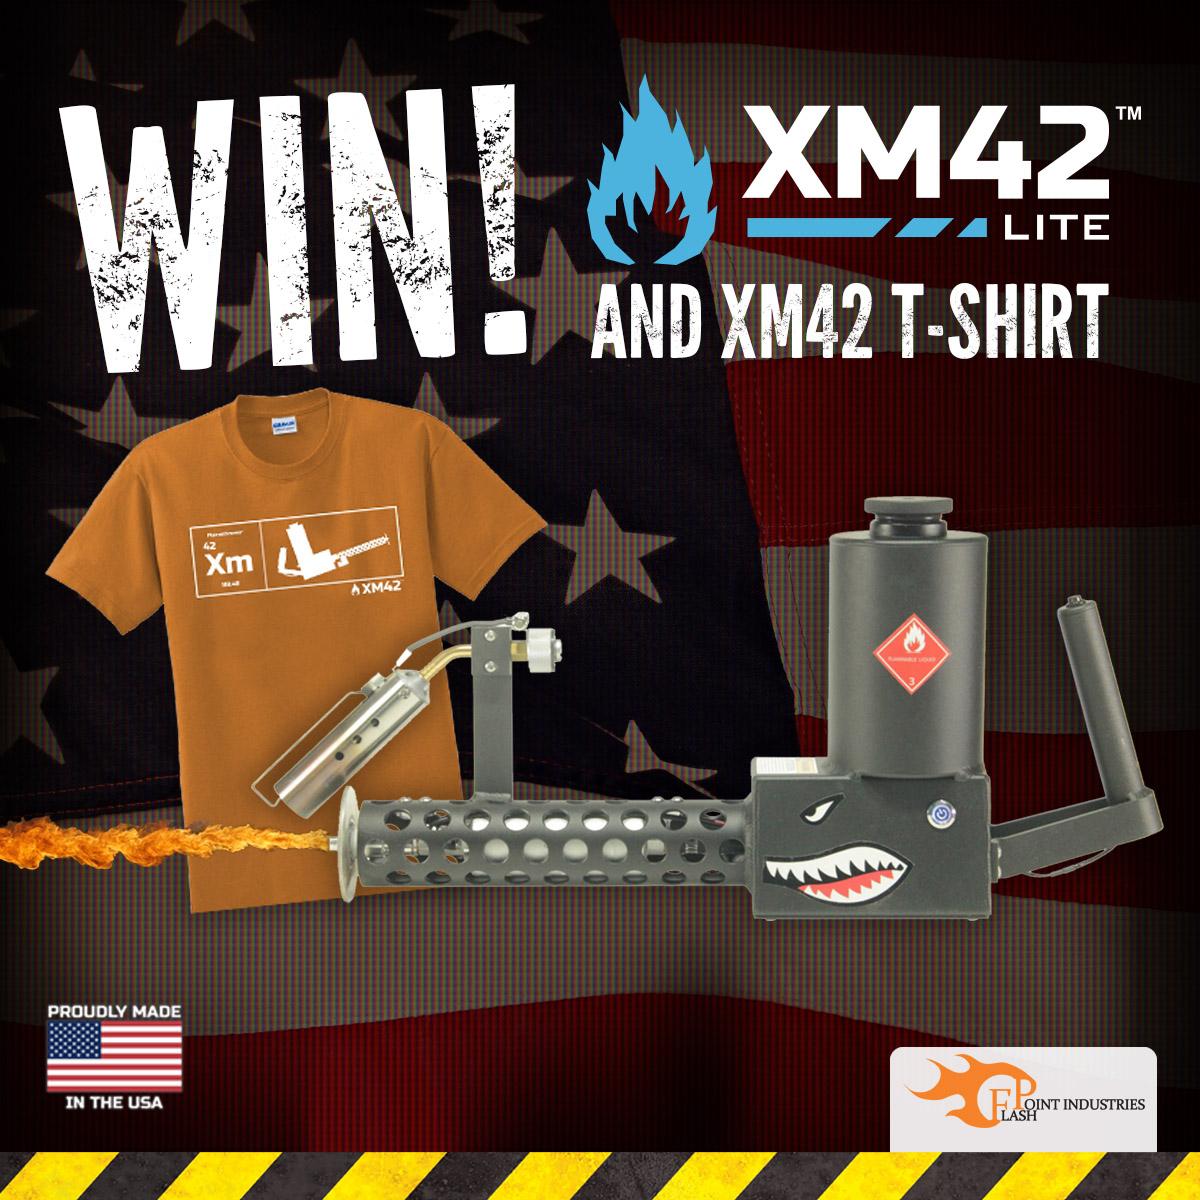 XM42 Lite Flamethrower Giveaway